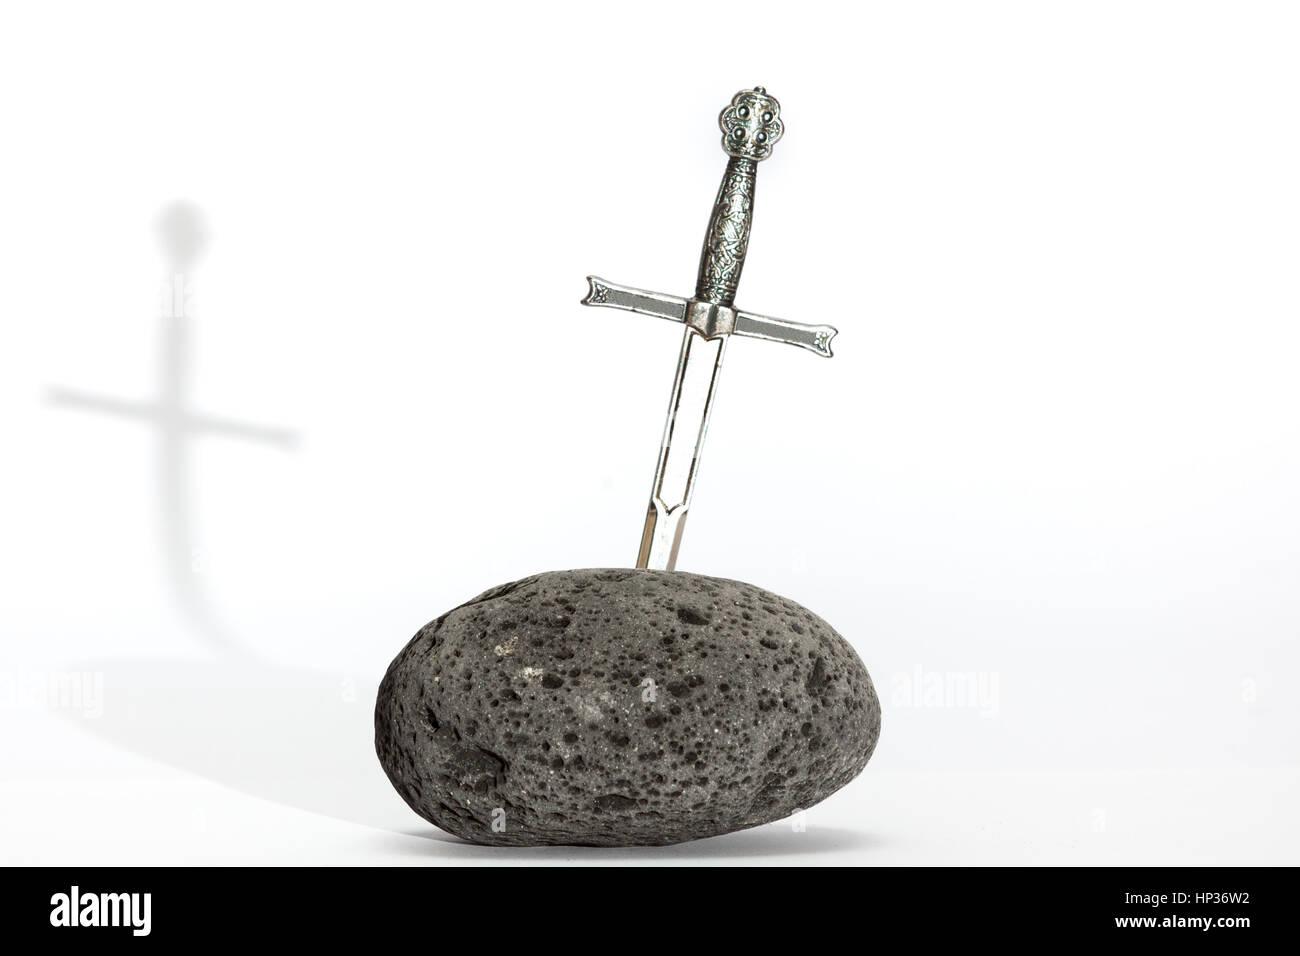 King Arthur sword in stone - Stock Image